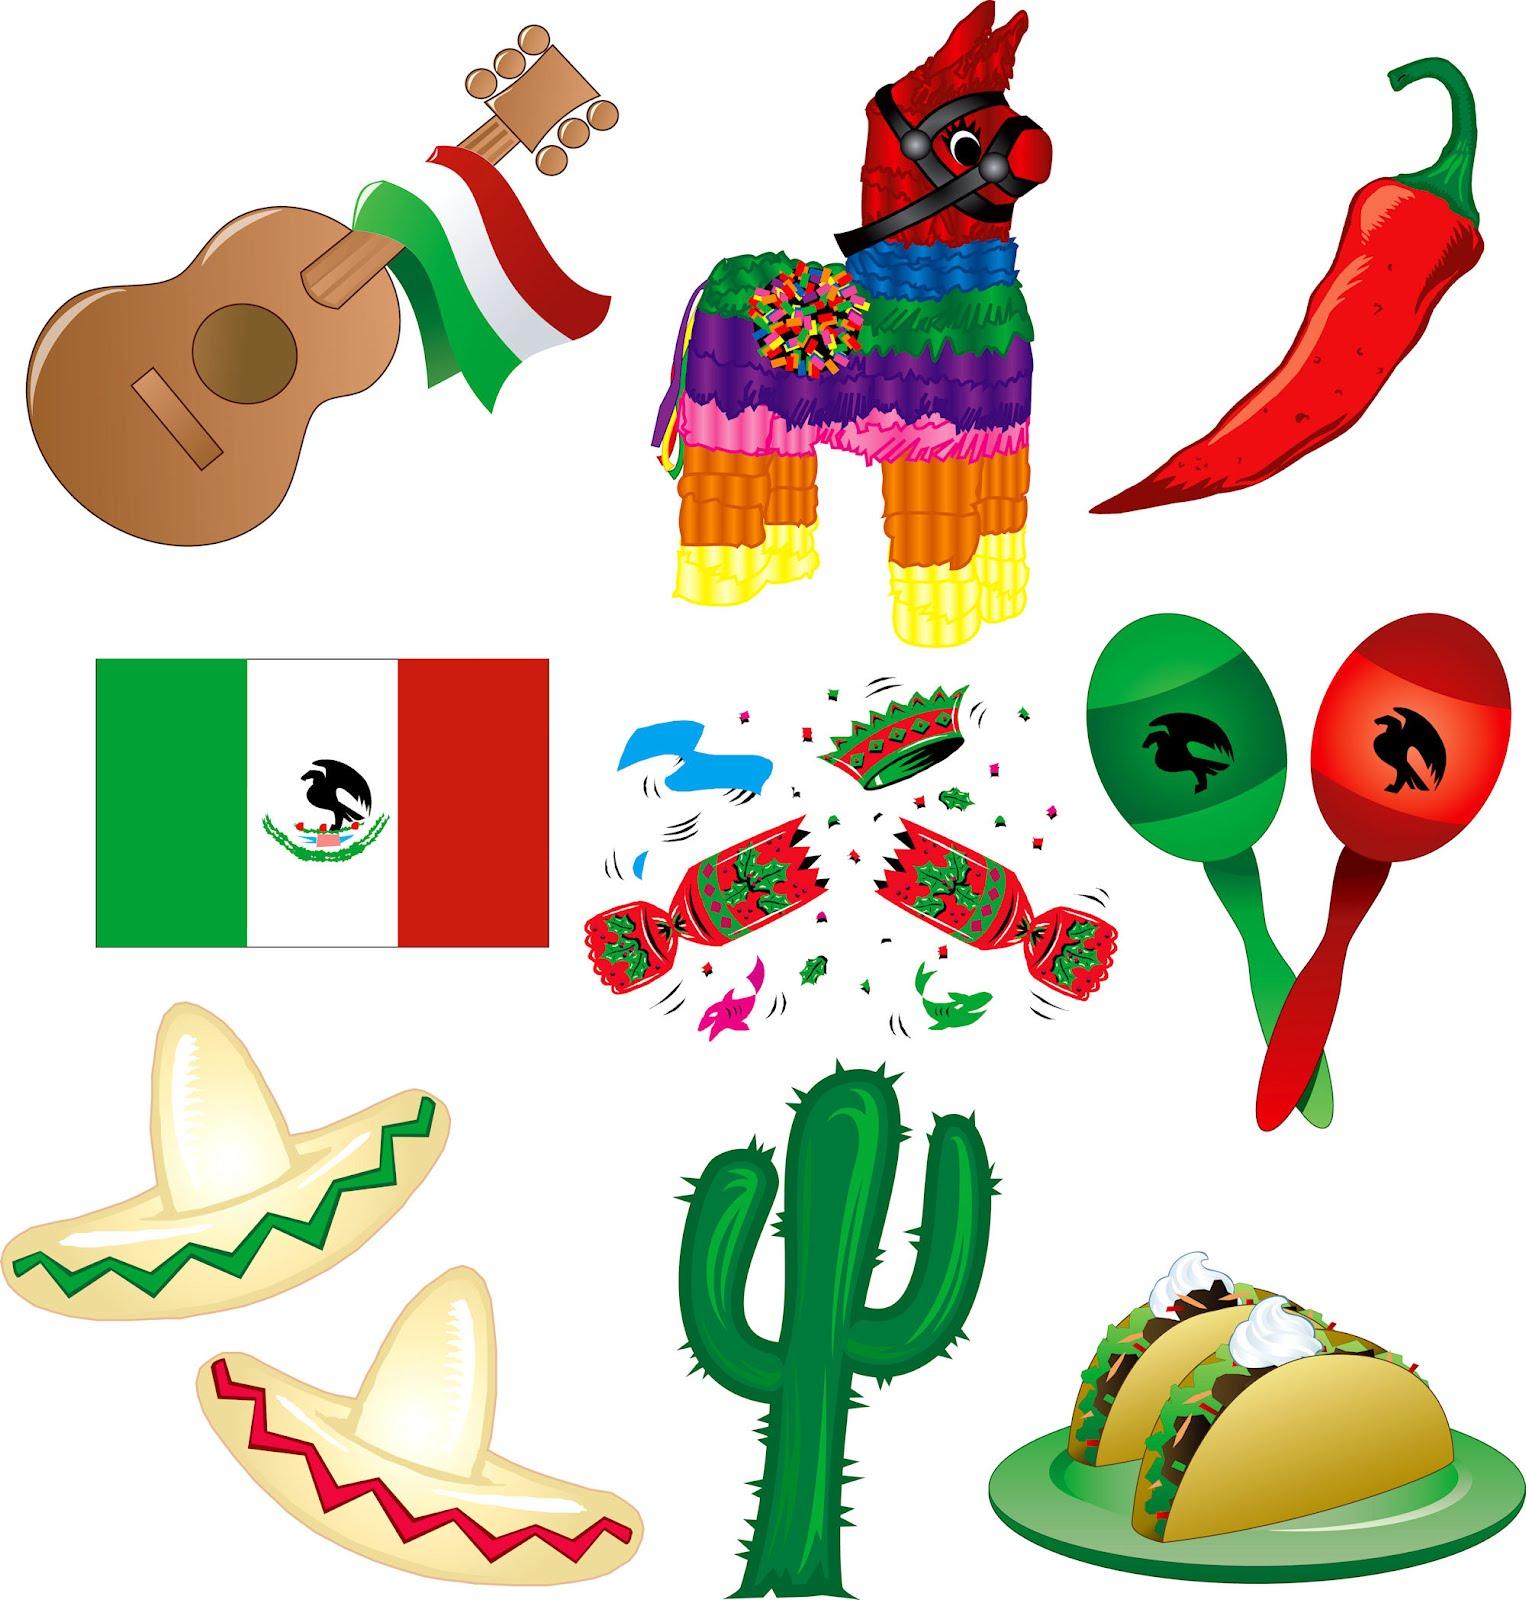 Mexican Culture Symbols N2 free image.